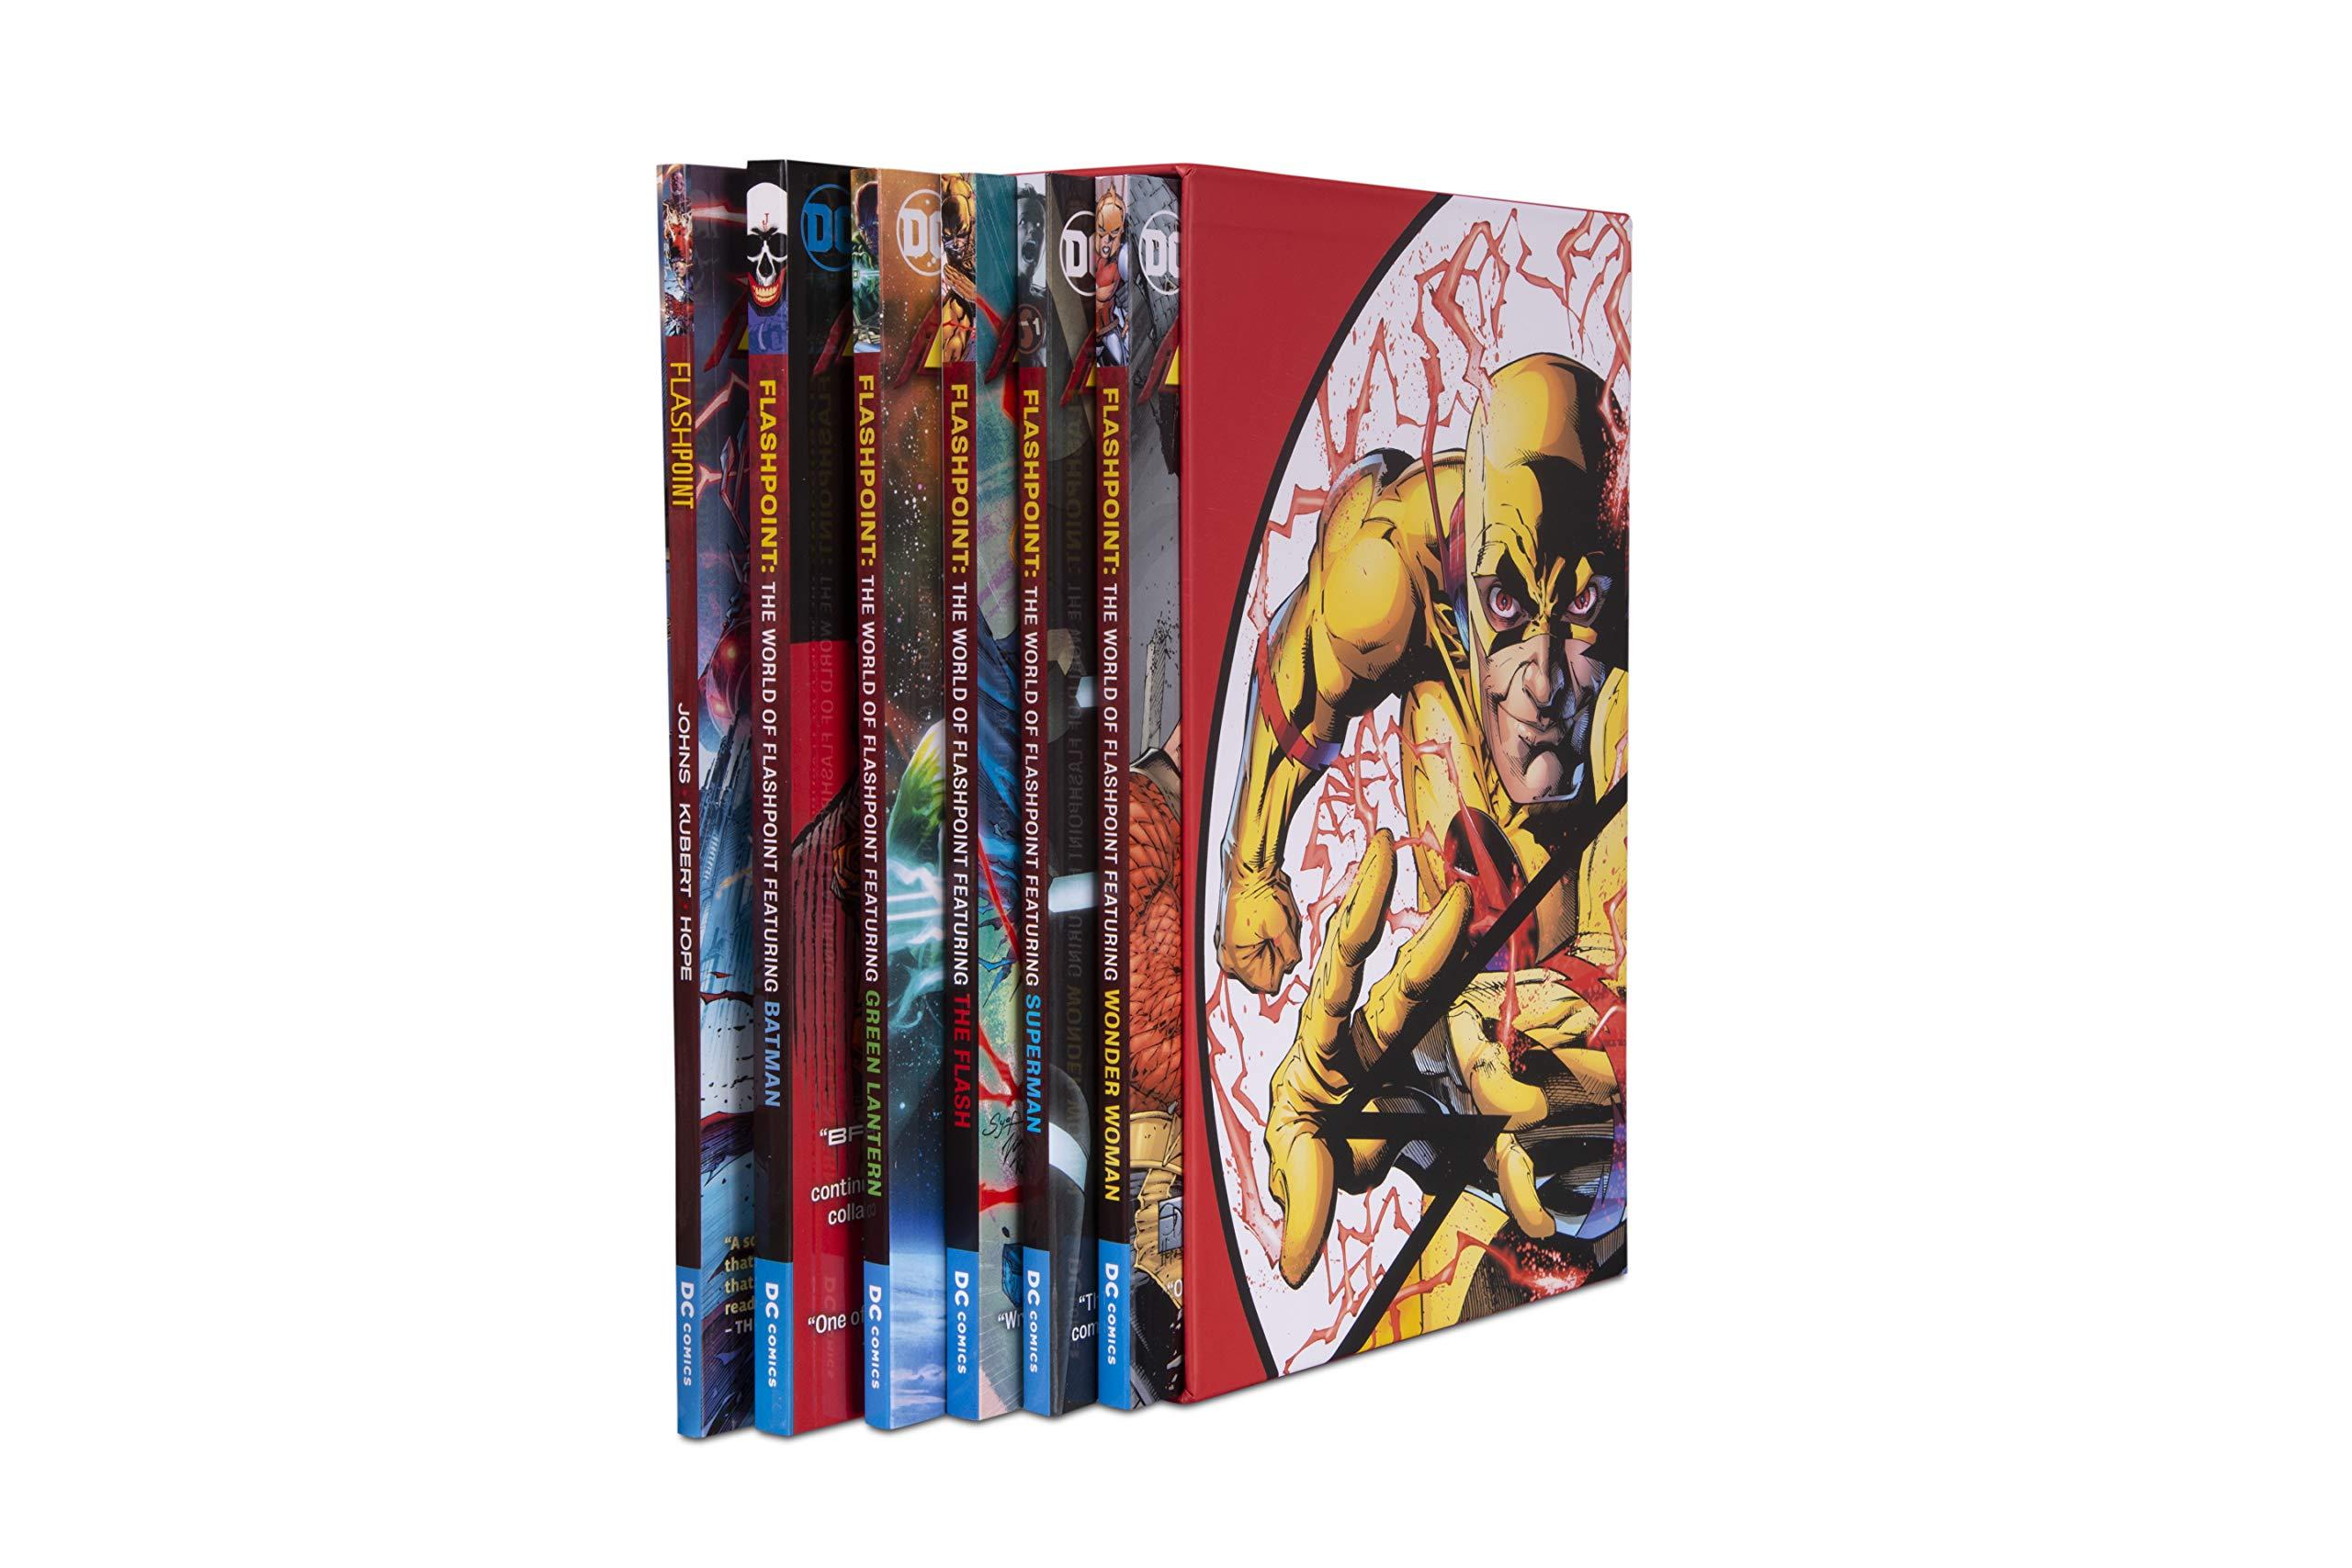 Flashpoint Box Set: Amazon.es: Geoff Johns: Libros en ...